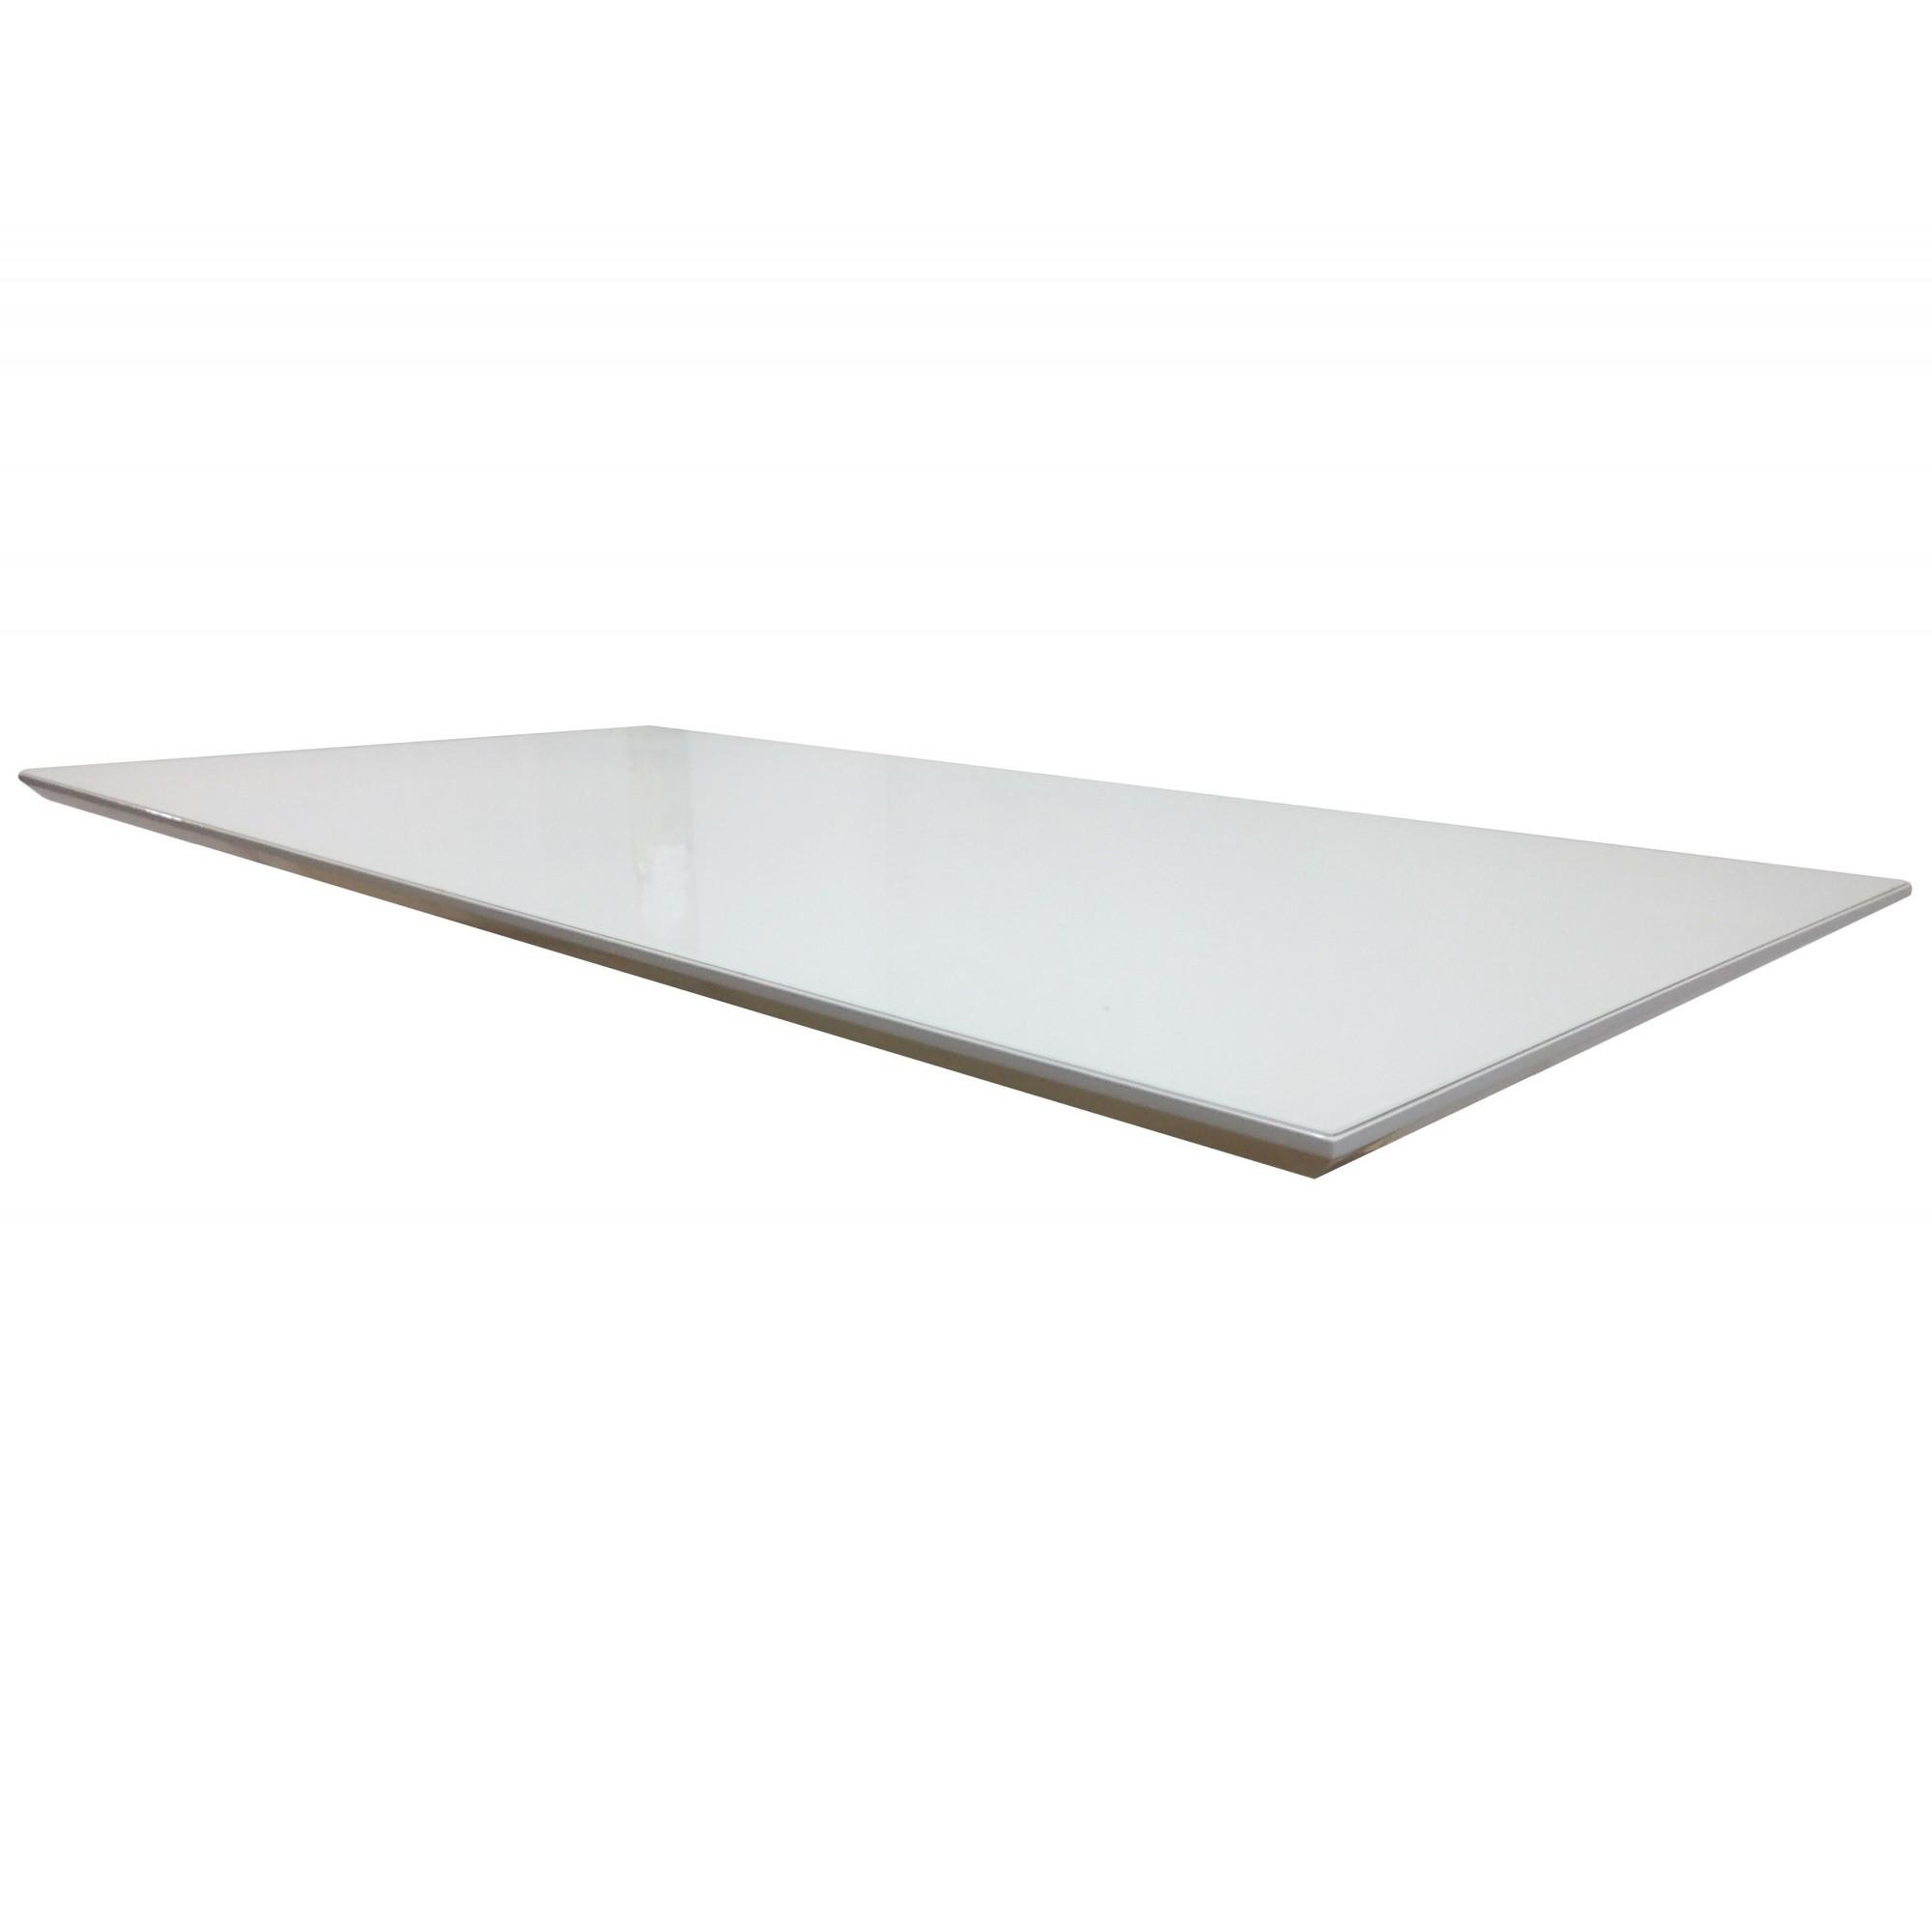 Tampo de MDF Mesa Sala Jantar Laqueado com Vidro 1,2 x 1,2 m